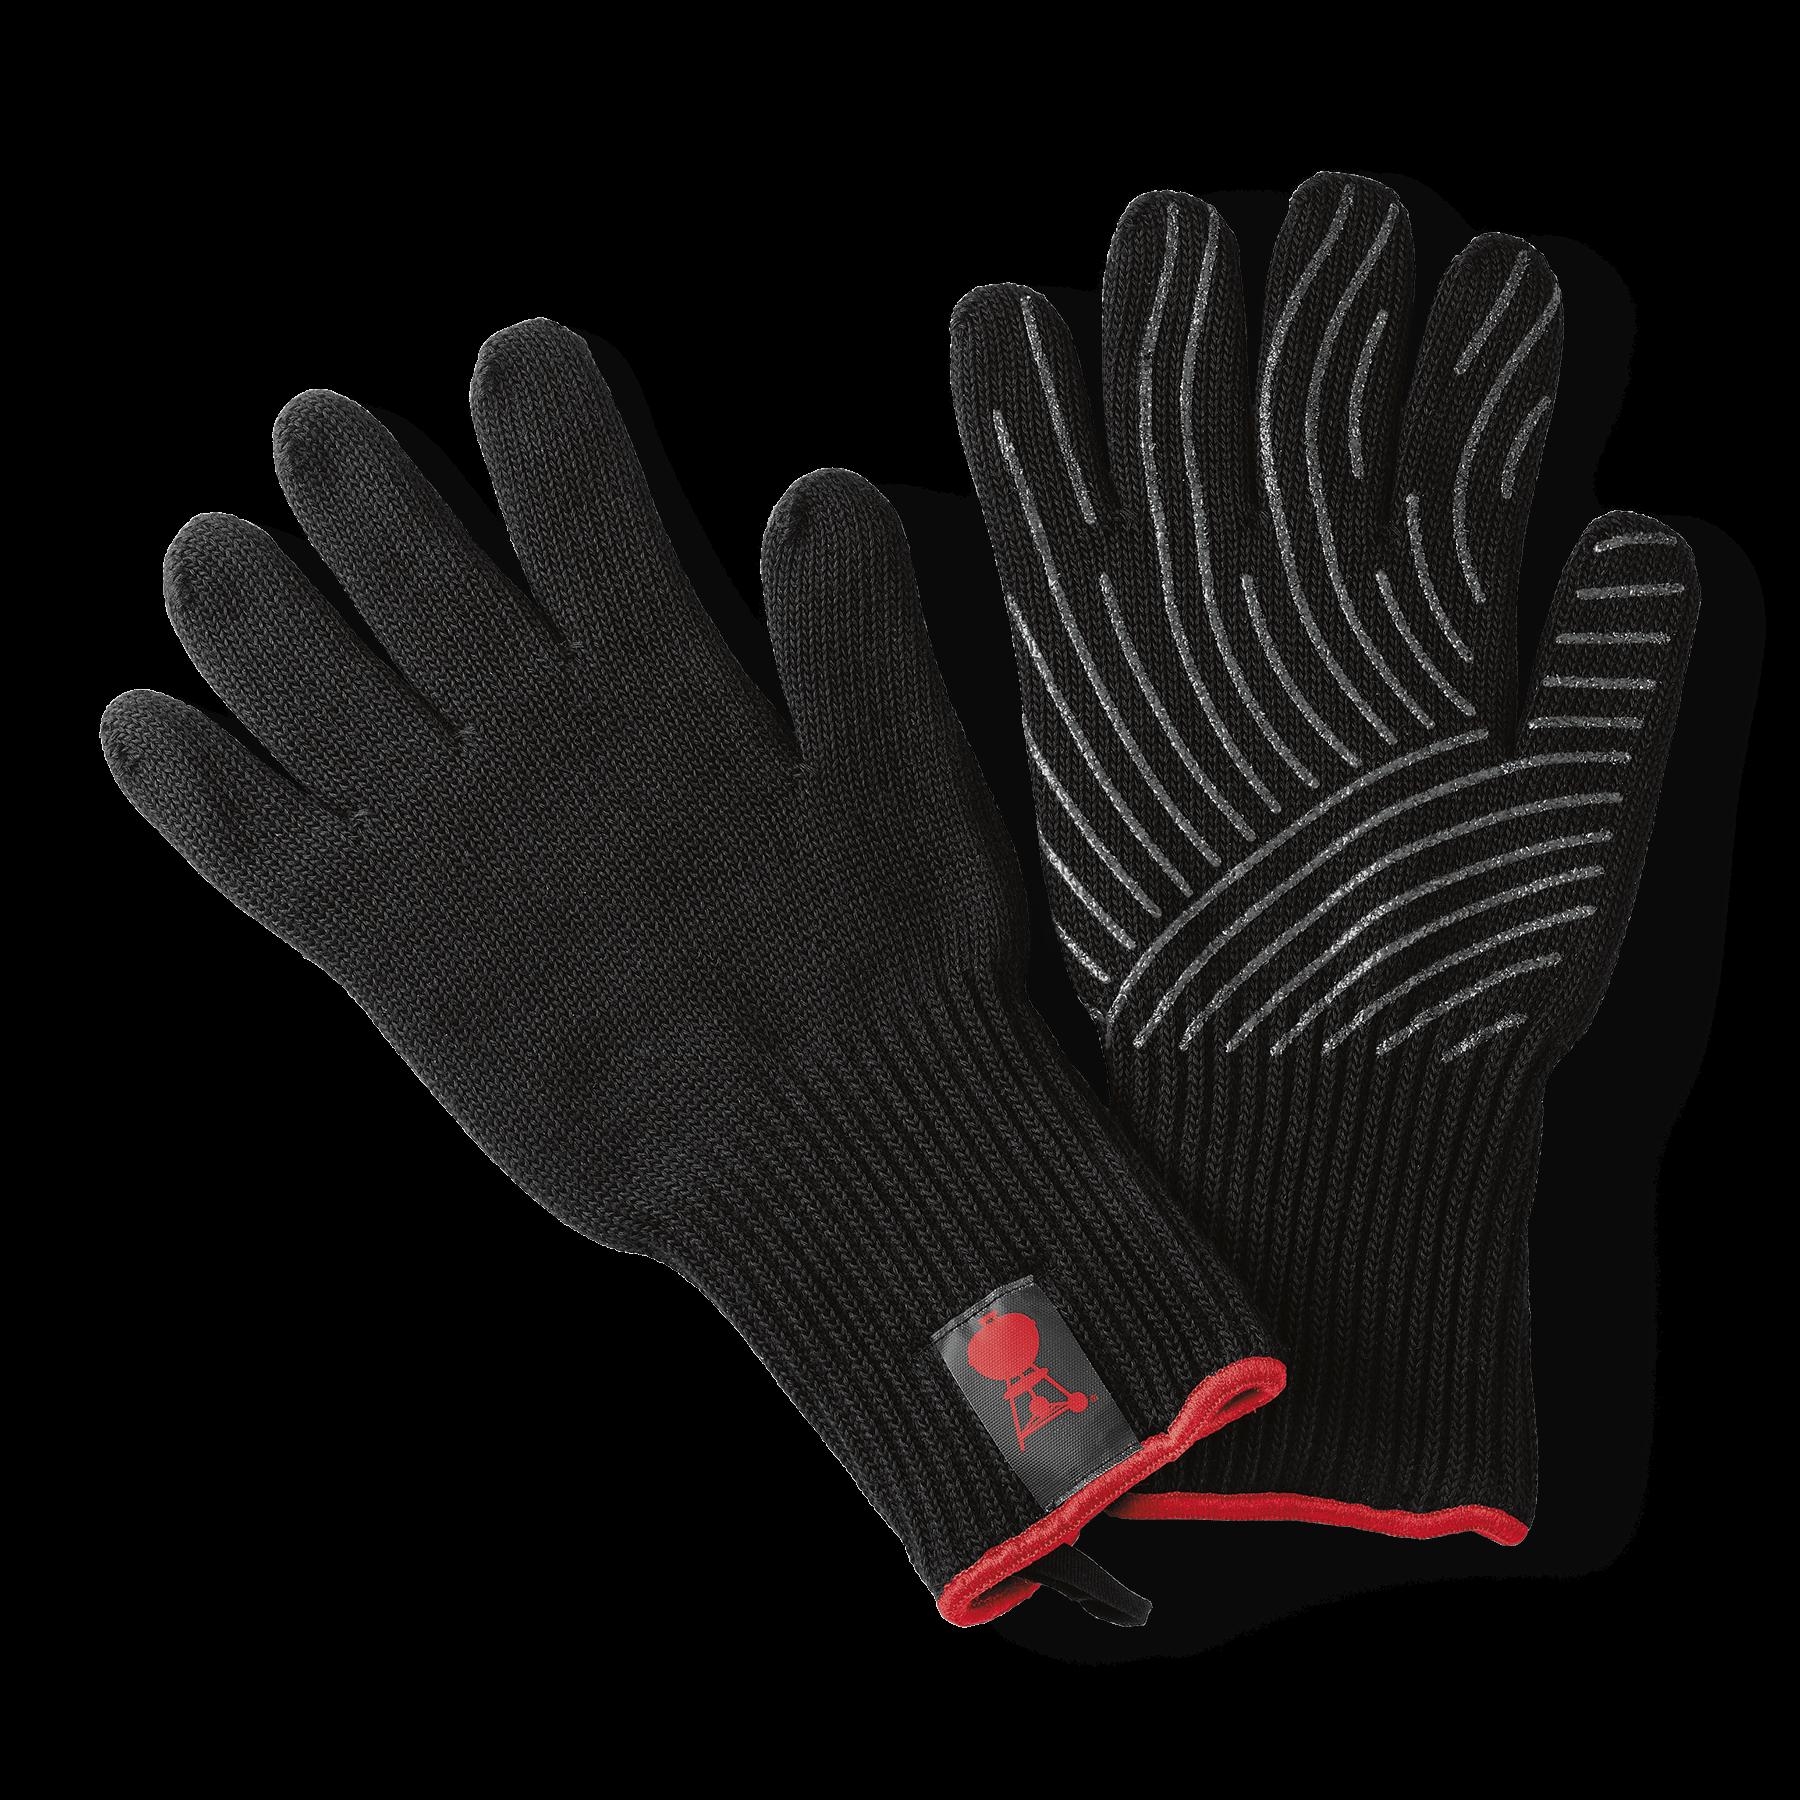 Premium handskesæt